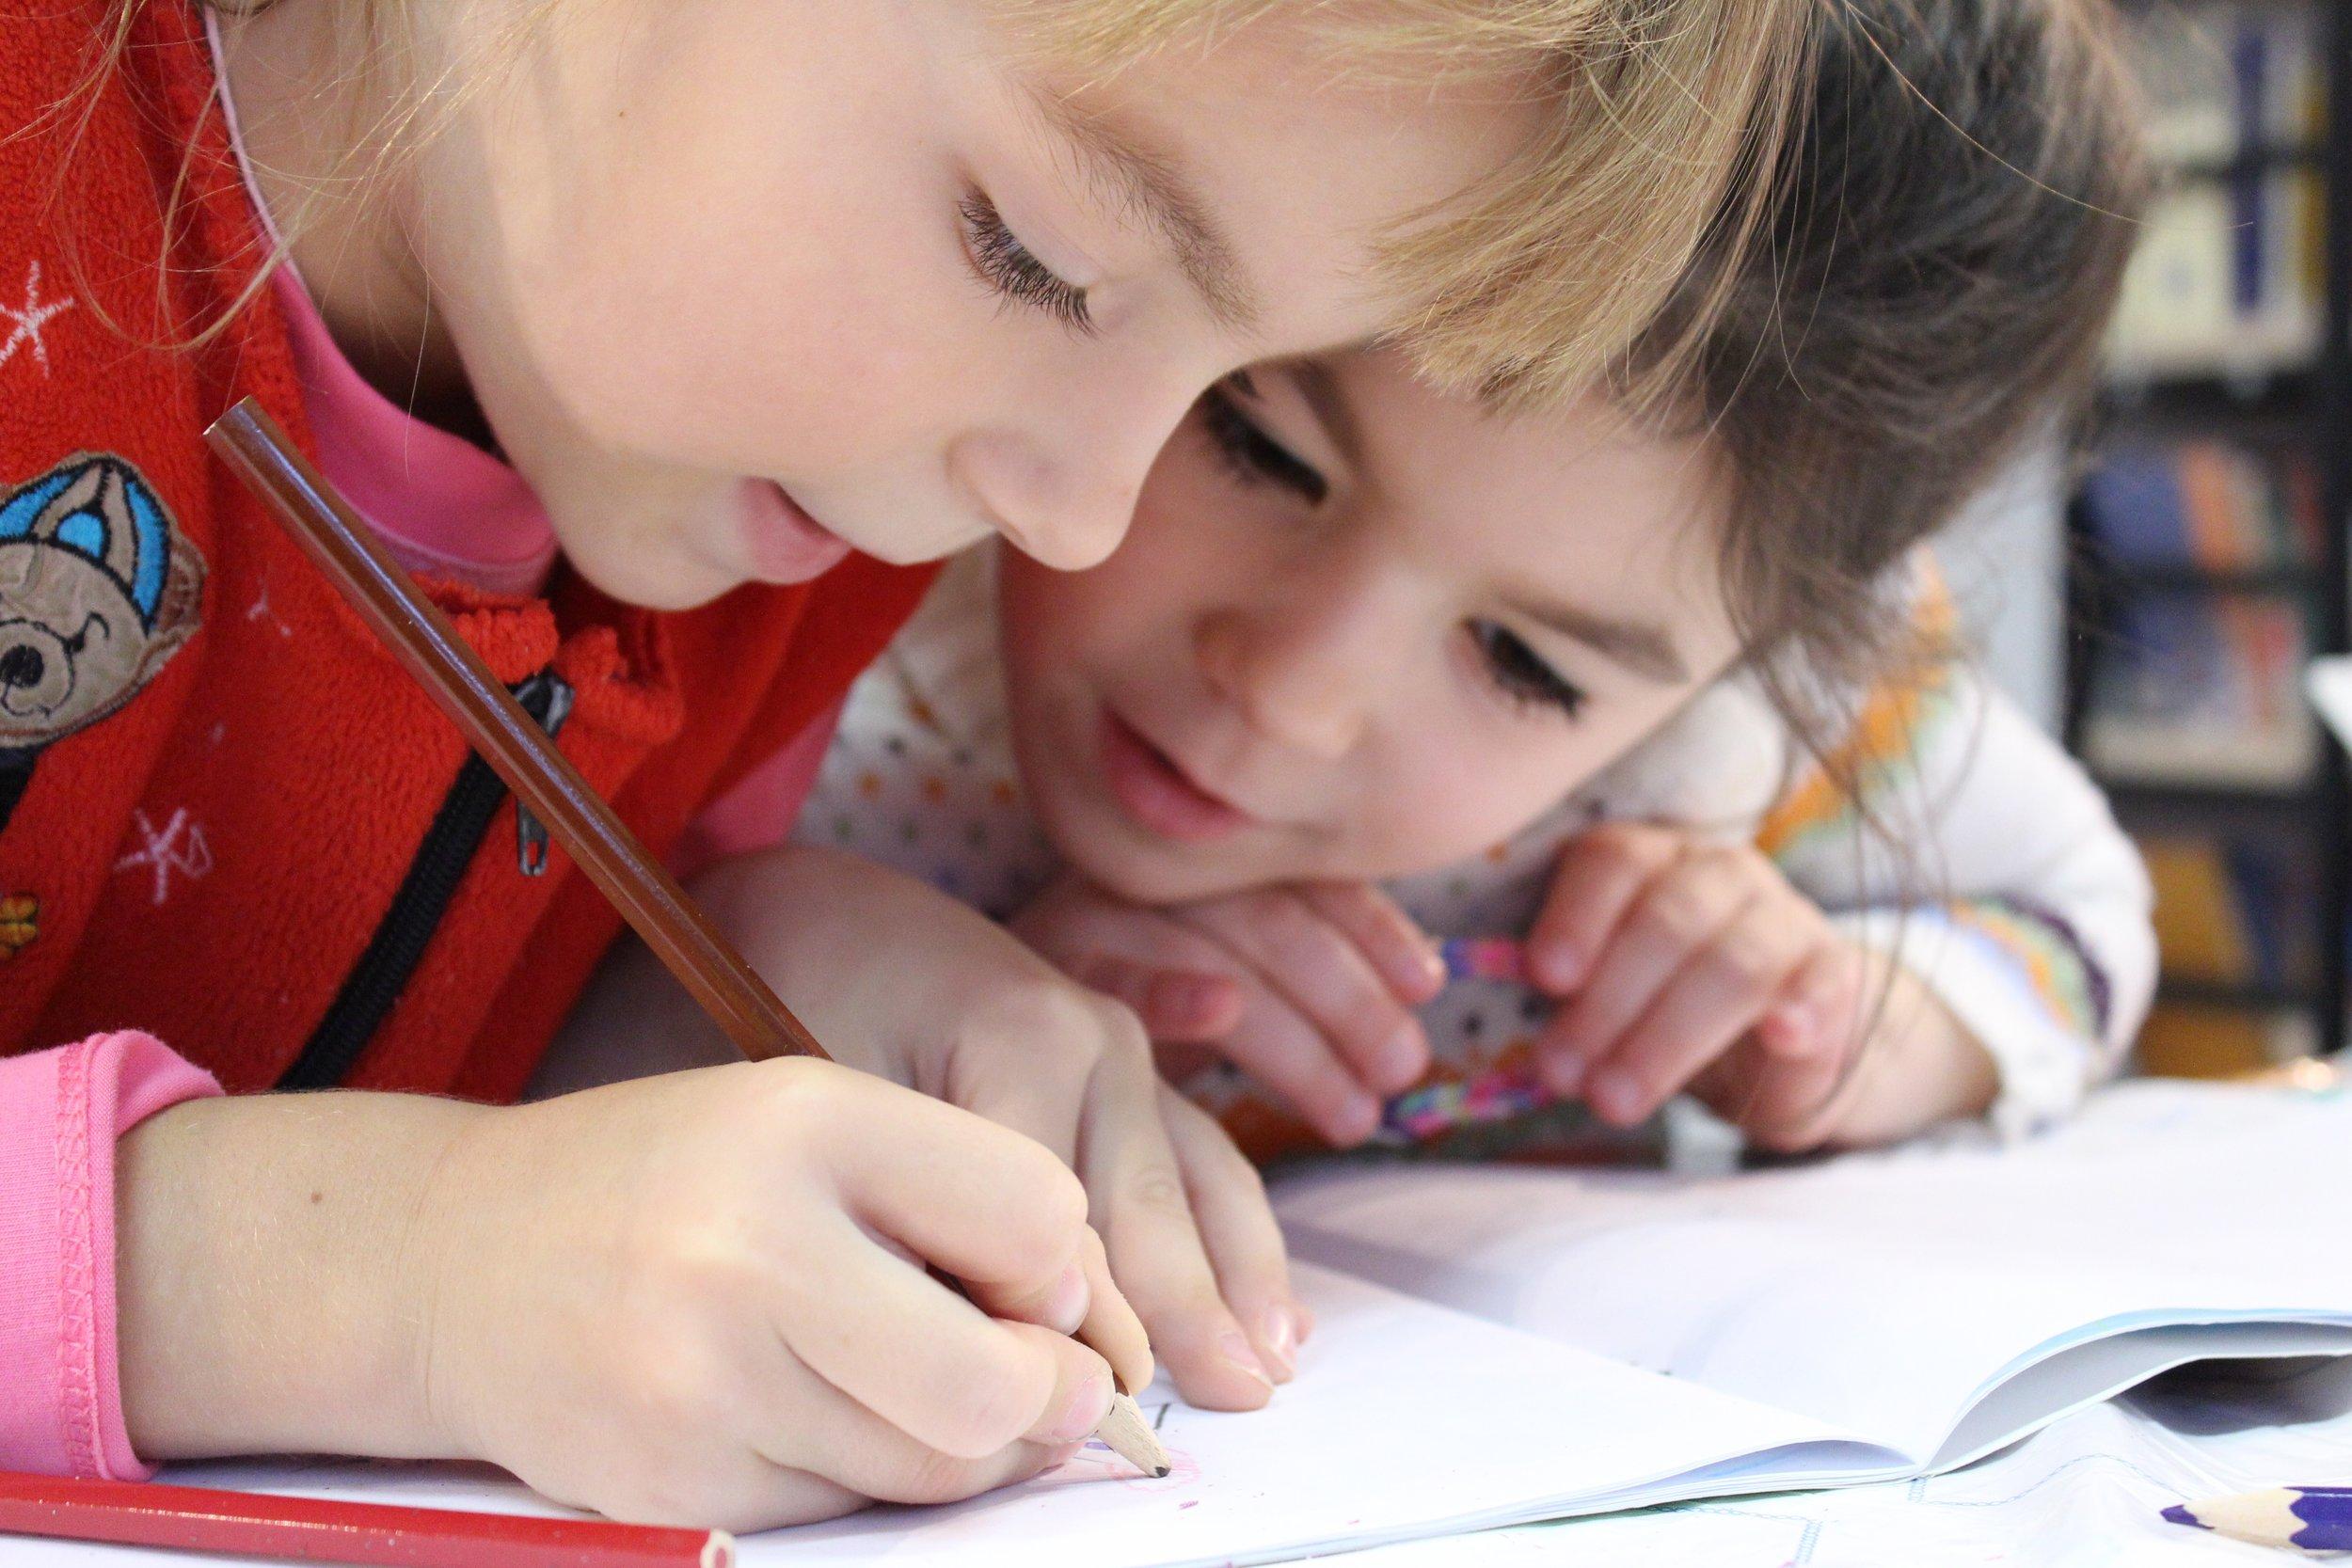 notebook-writing-person-pencil-girl-play-837883-pxhere.com.jpg